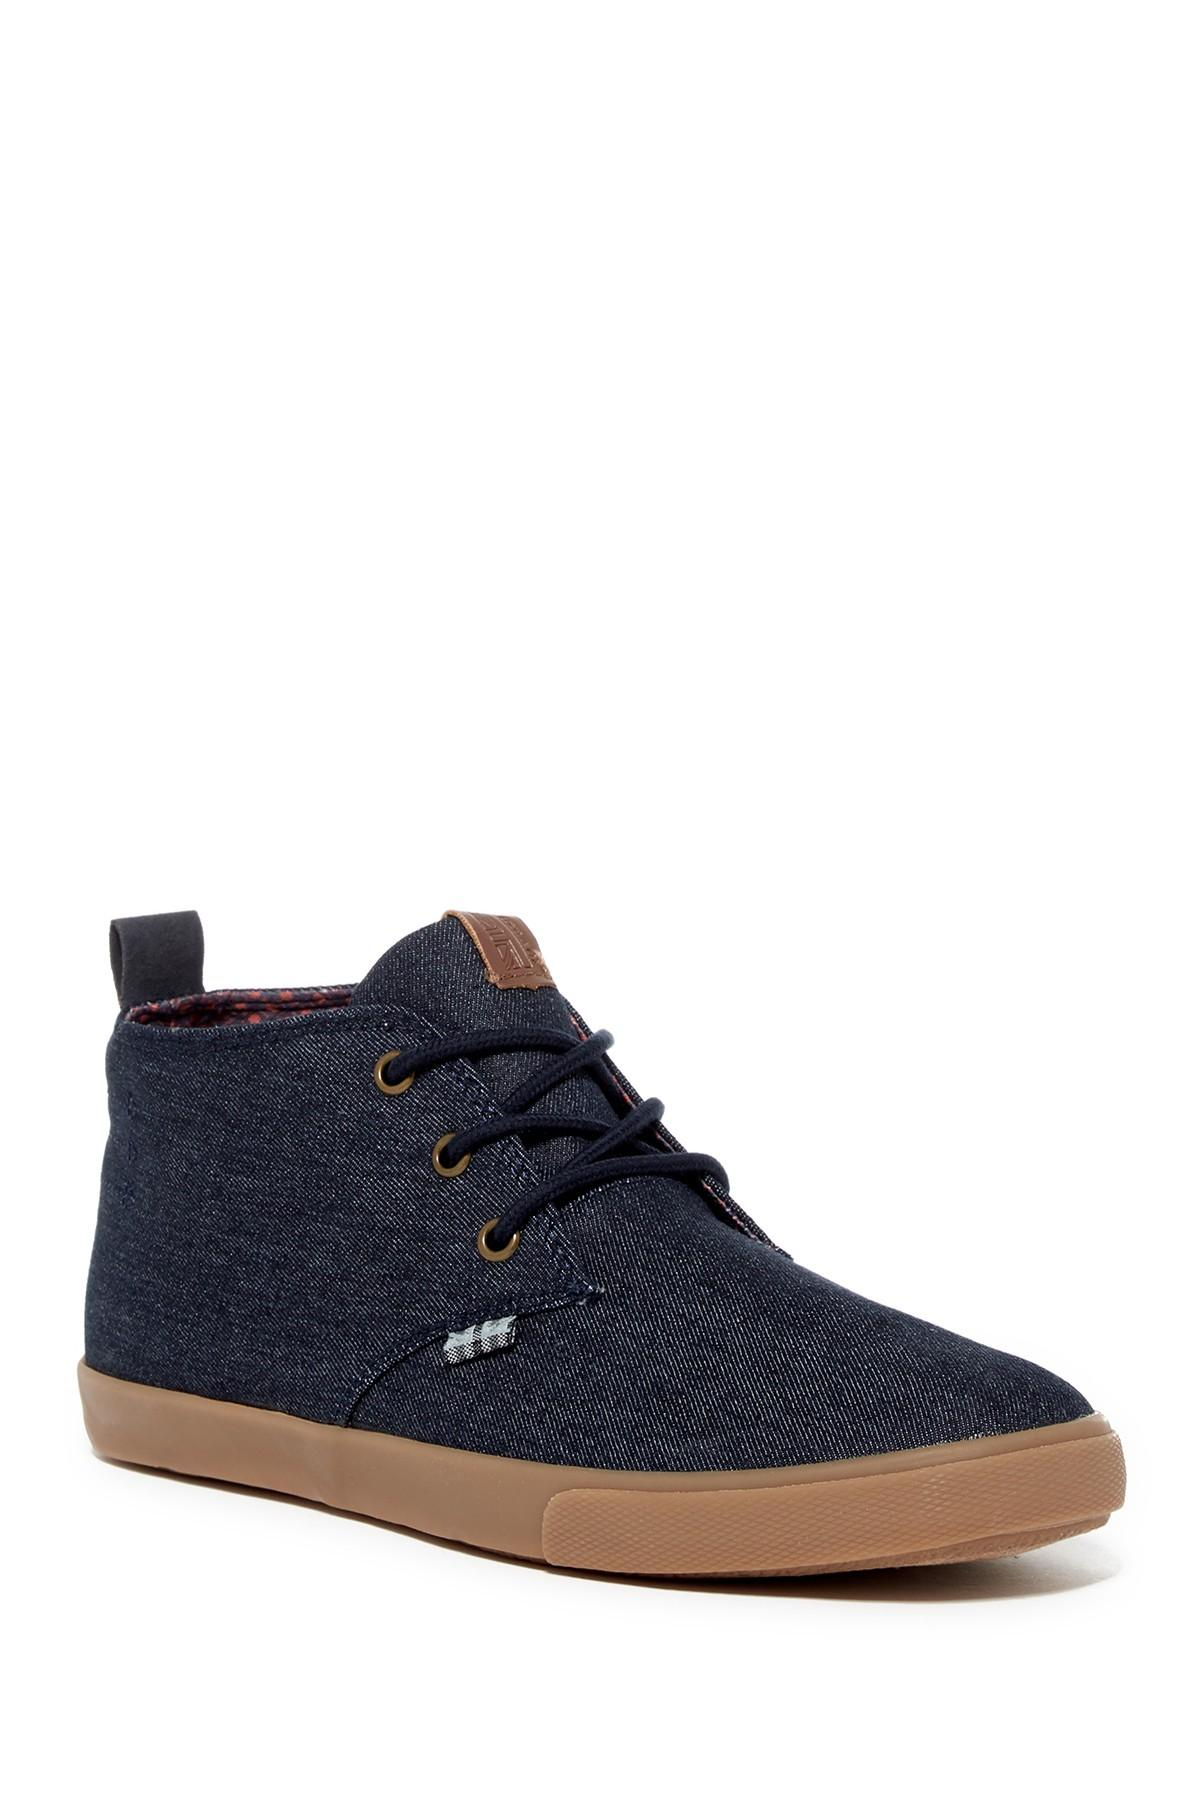 ben sherman bristol chukka sneaker in blue for men lyst